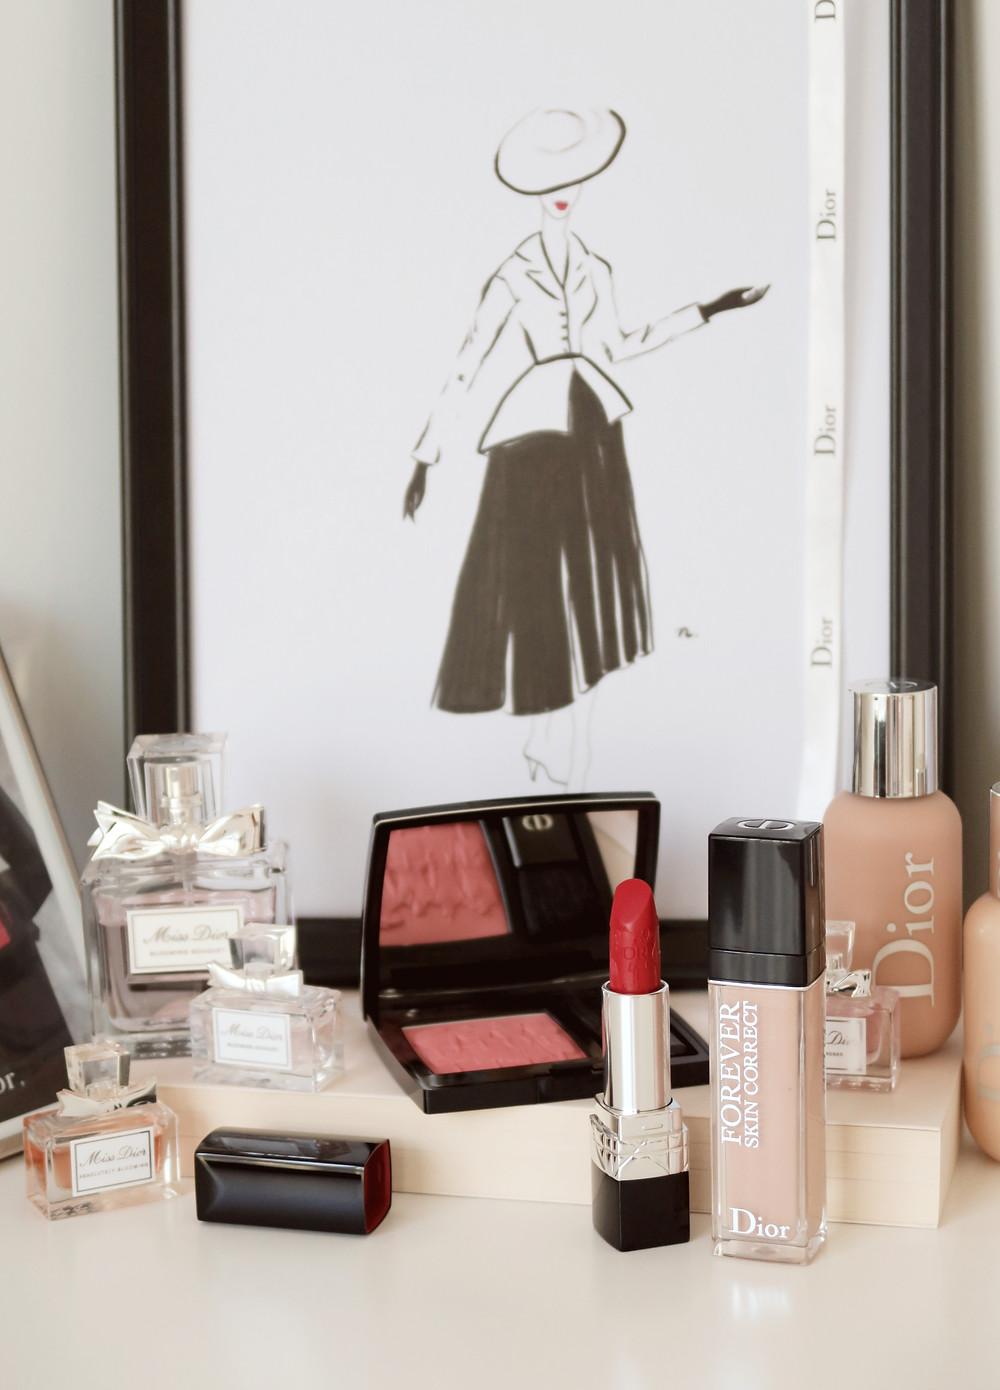 Dior New Look 47 Makeup